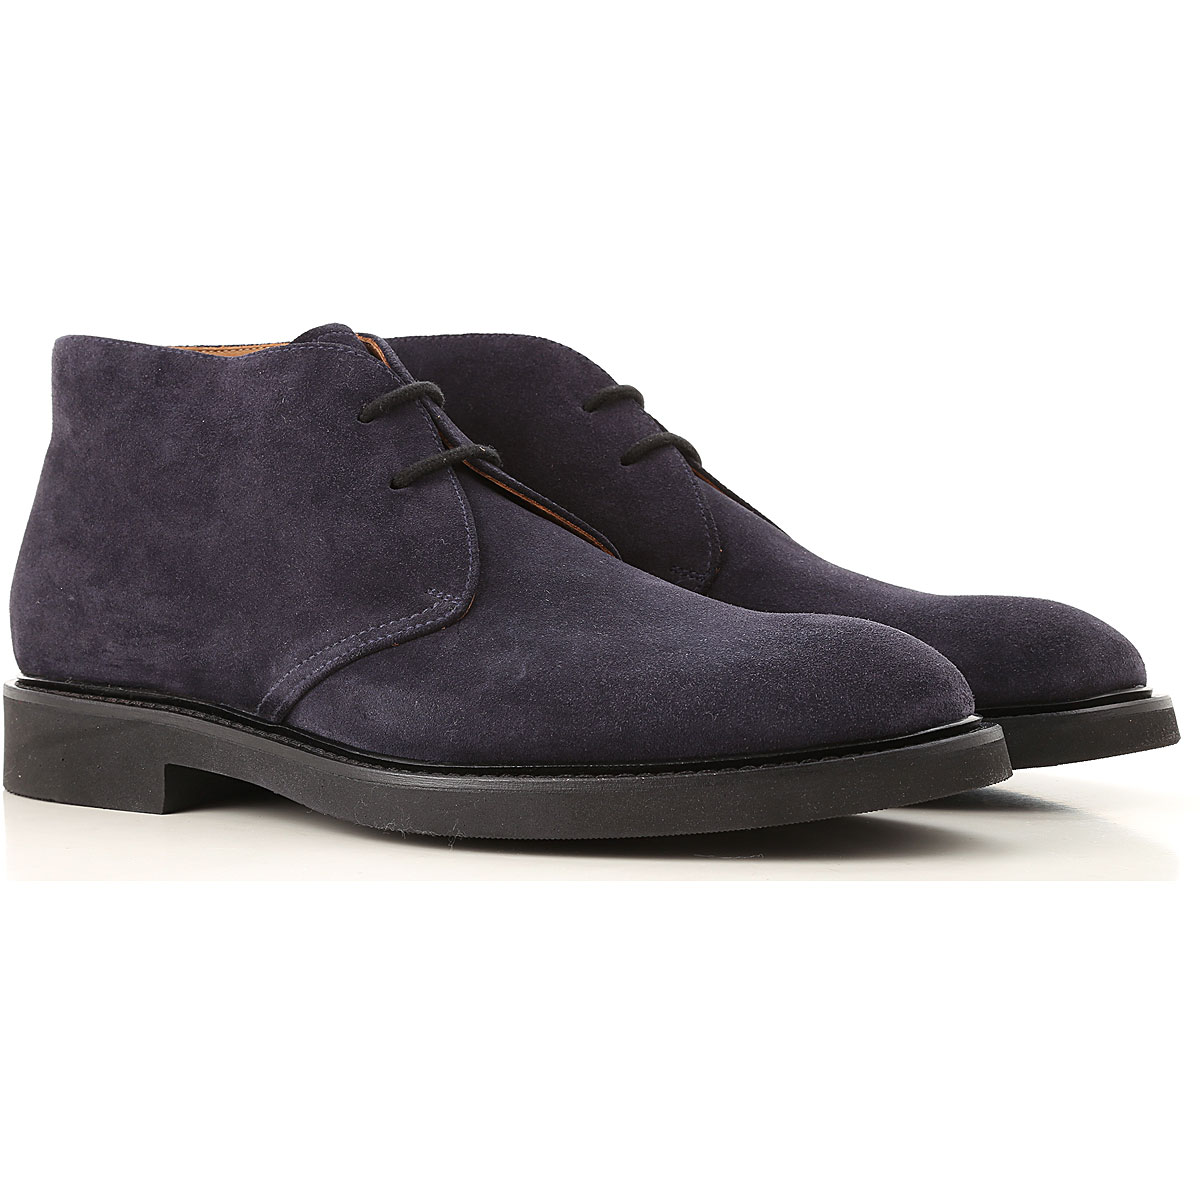 Image of Doucals Desert Boots Chukka for Men, Dark Blue, suede, 2017, 10 10.5 11.5 7.5 8 9